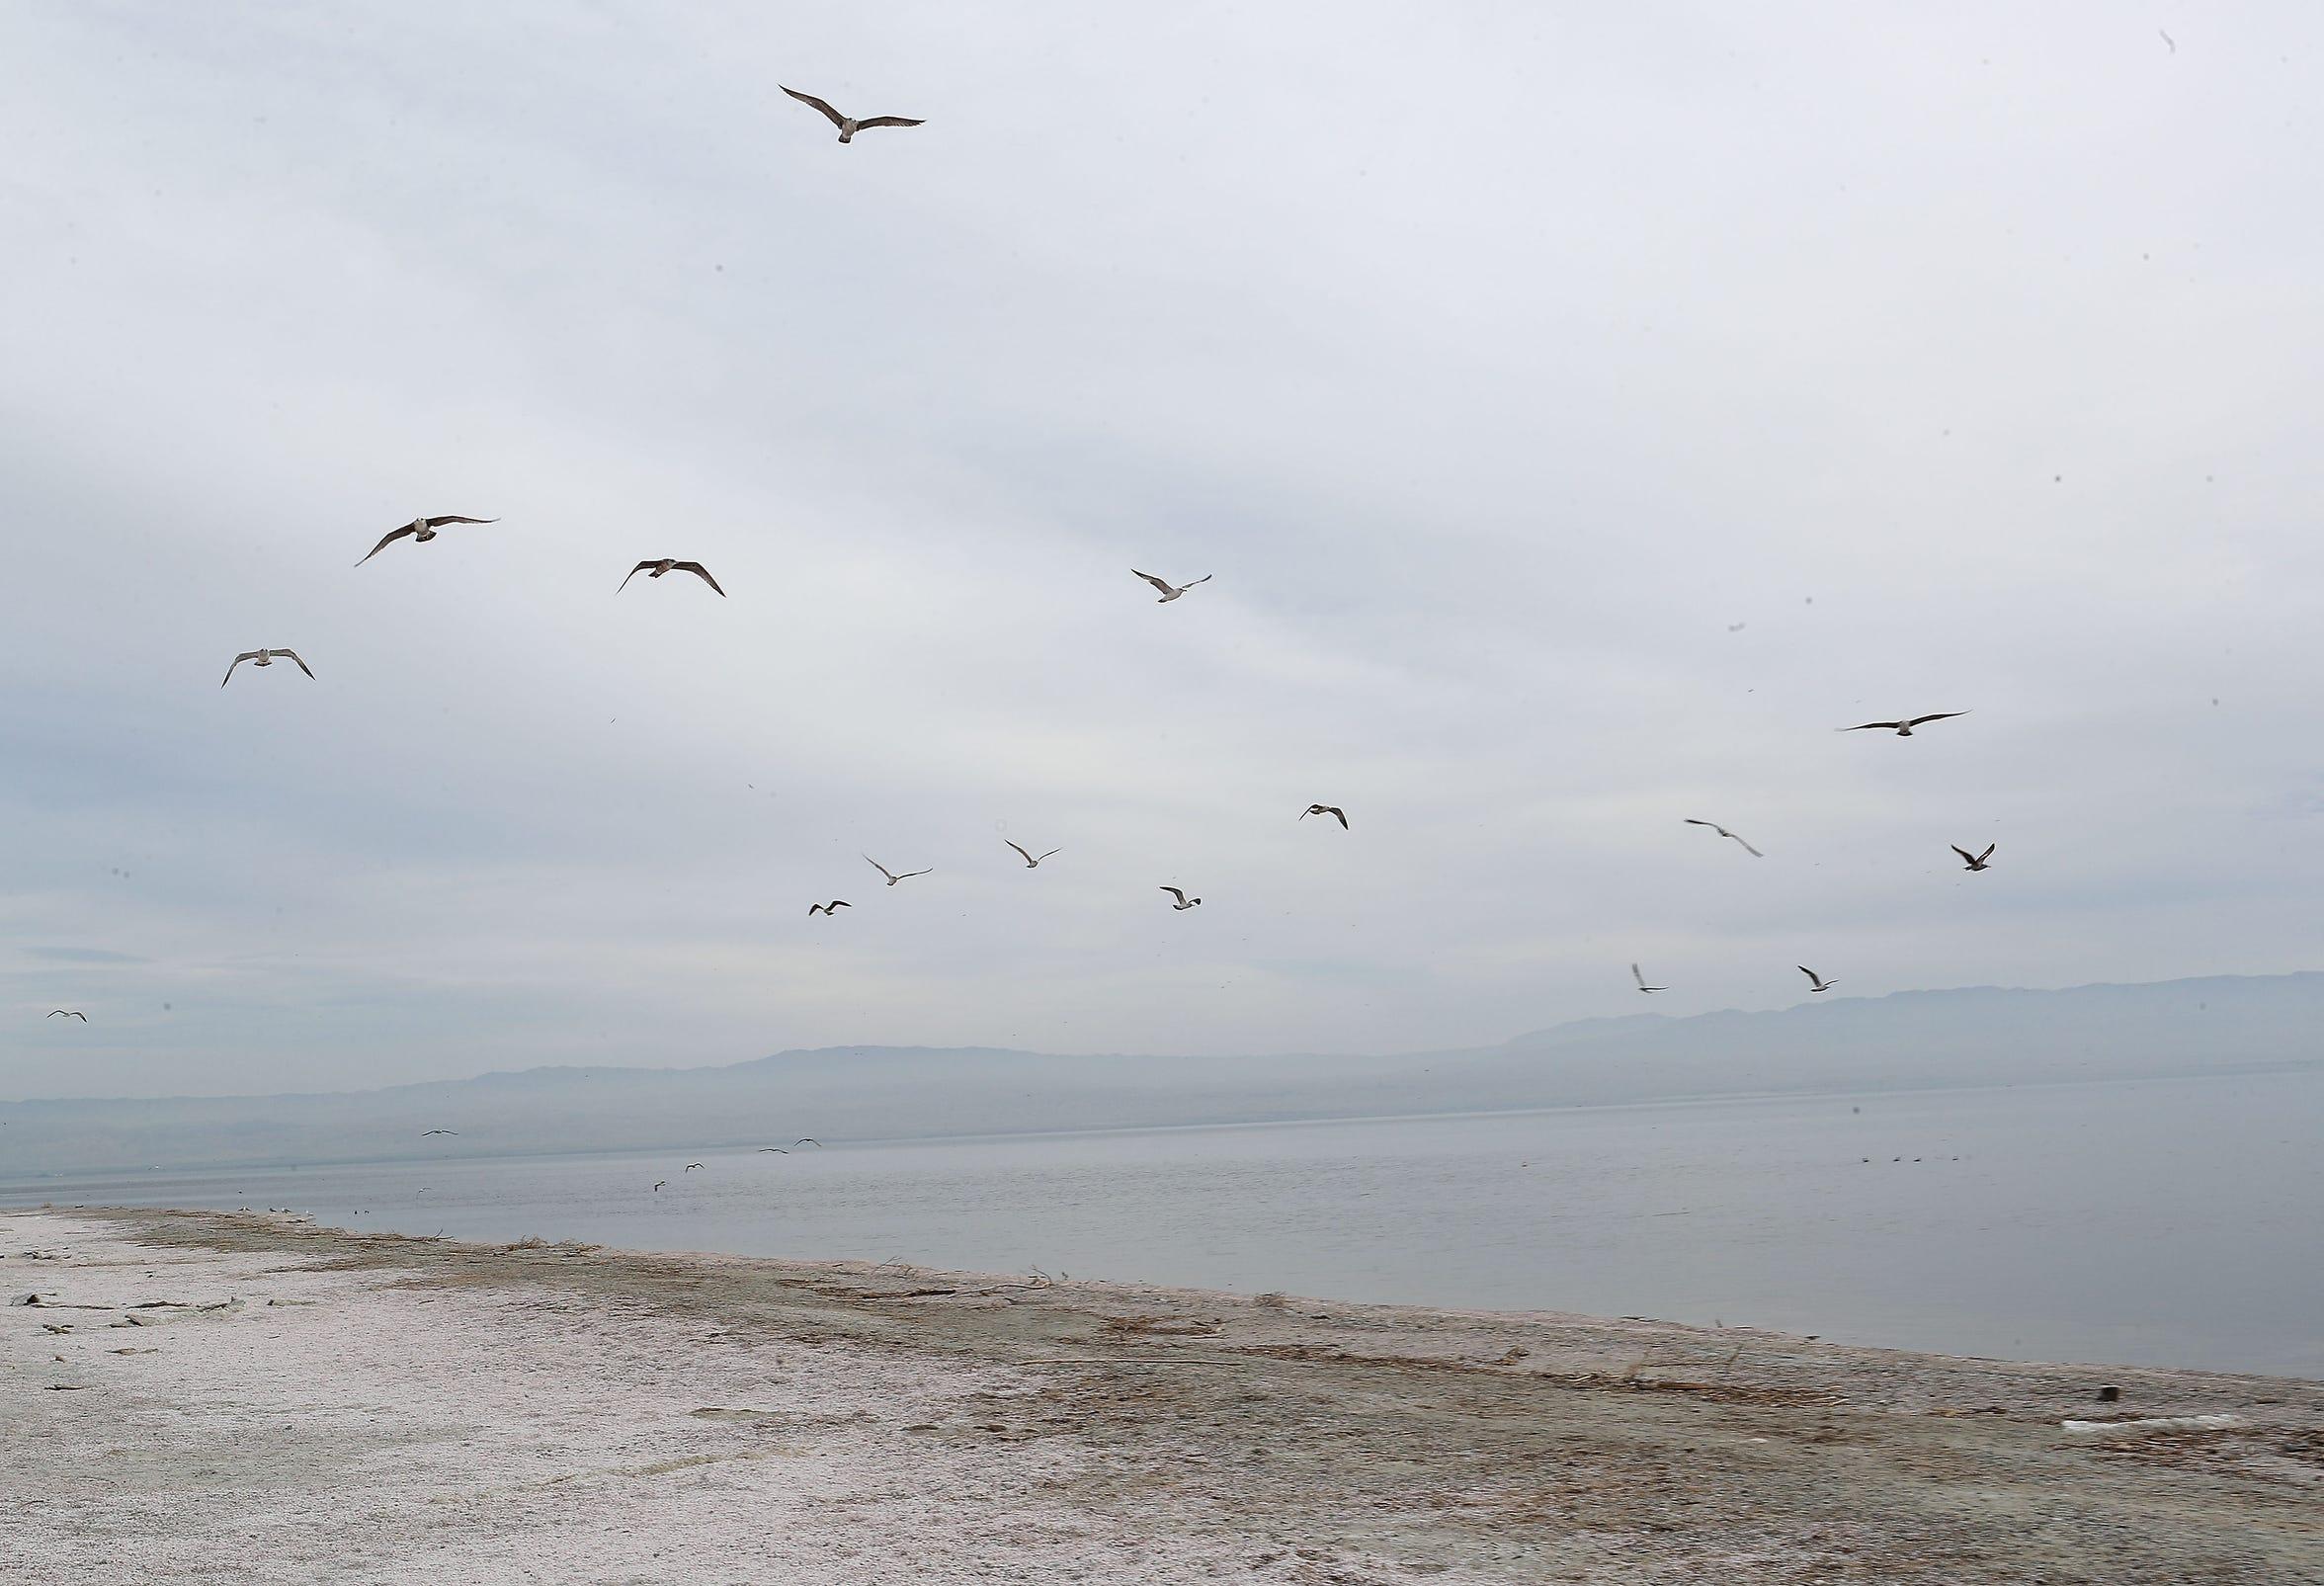 Gulls flies over the Salton Sea near Desert Shores, March 27, 2019.